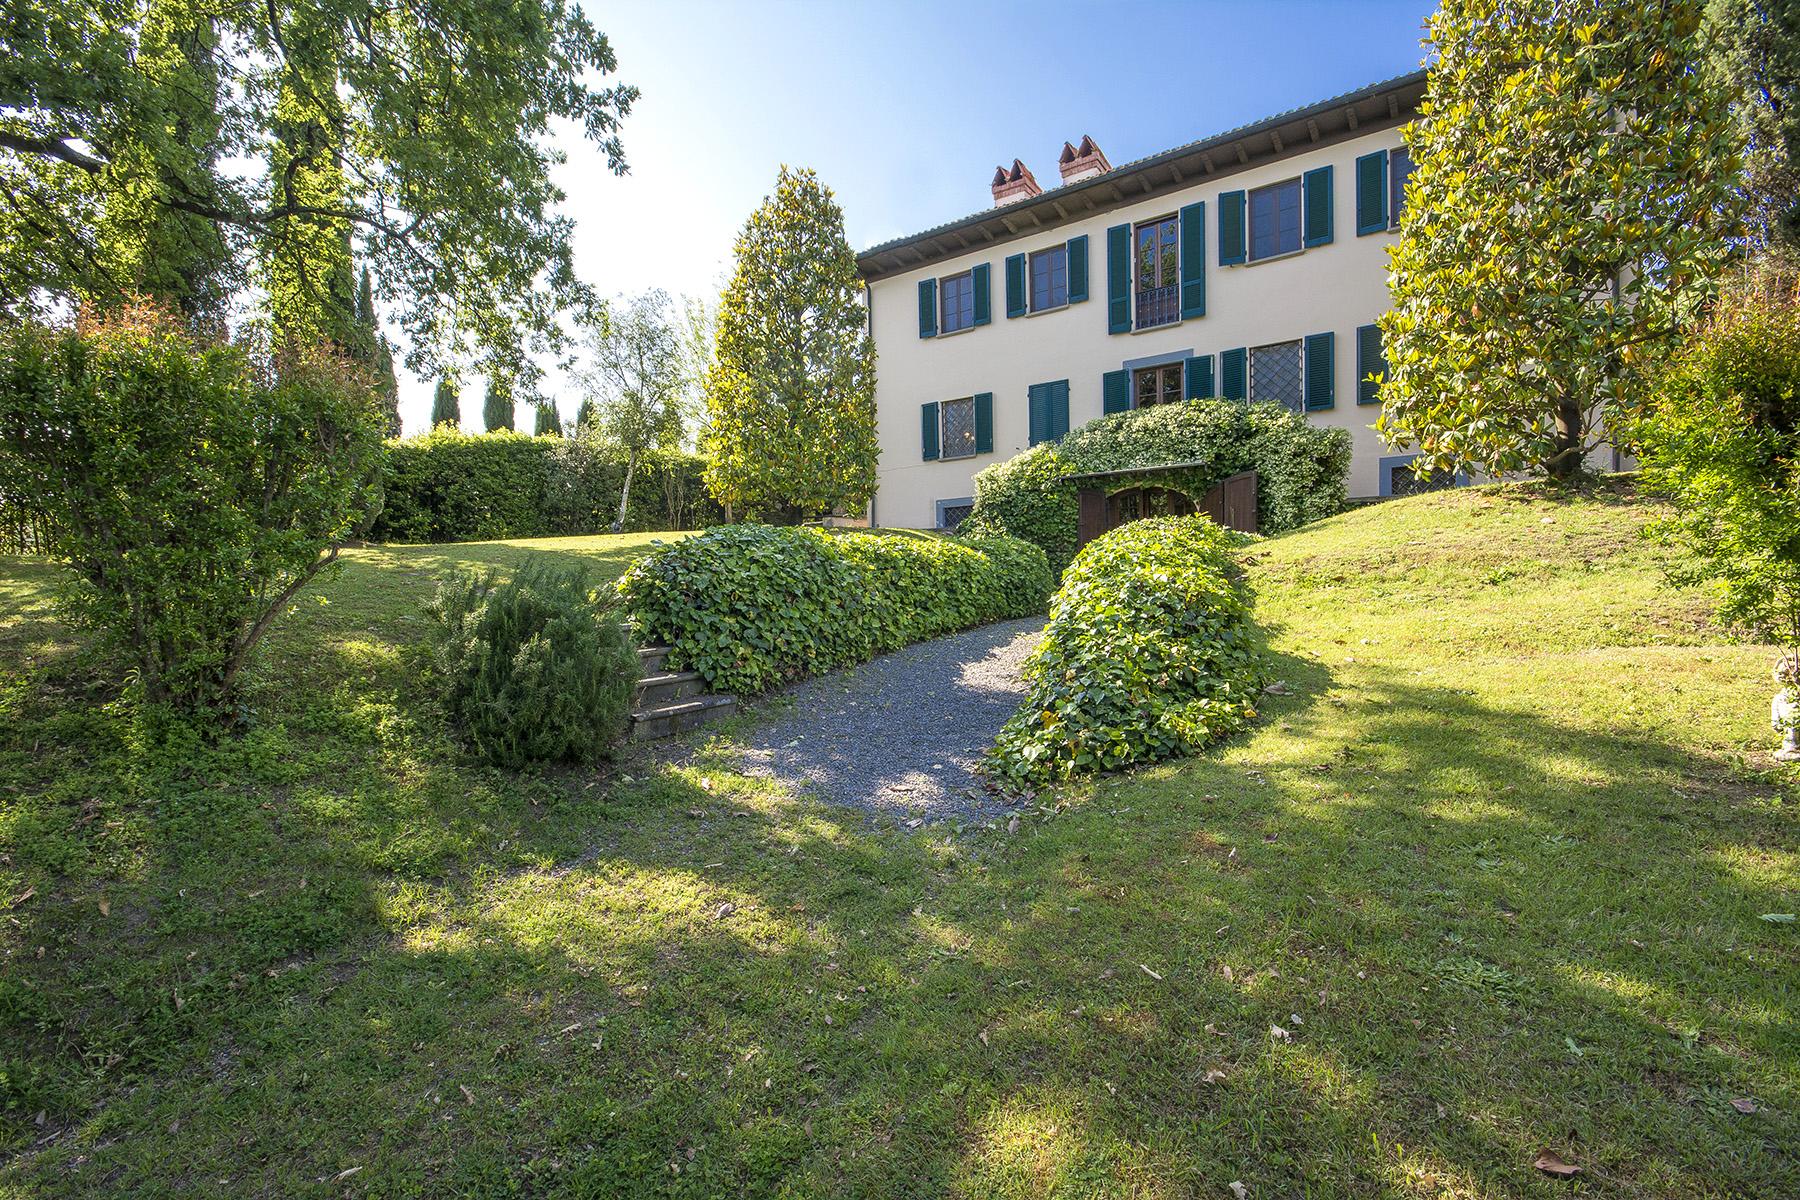 Villa in Vendita a Lucca: 5 locali, 600 mq - Foto 6